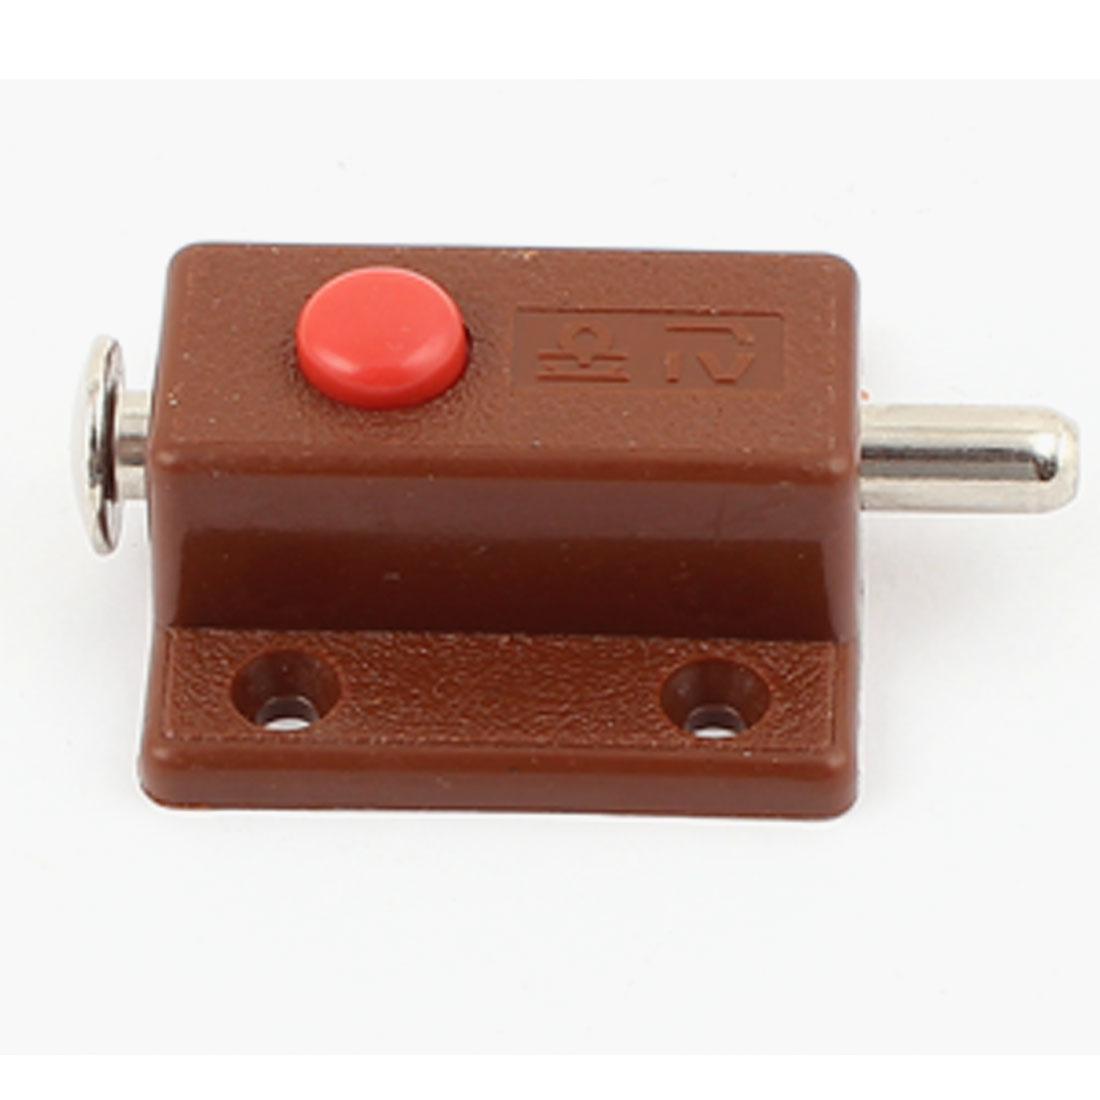 Button Control Gate Cupboard Door Security Latch Lock Brown Automatic Barrel Bolt